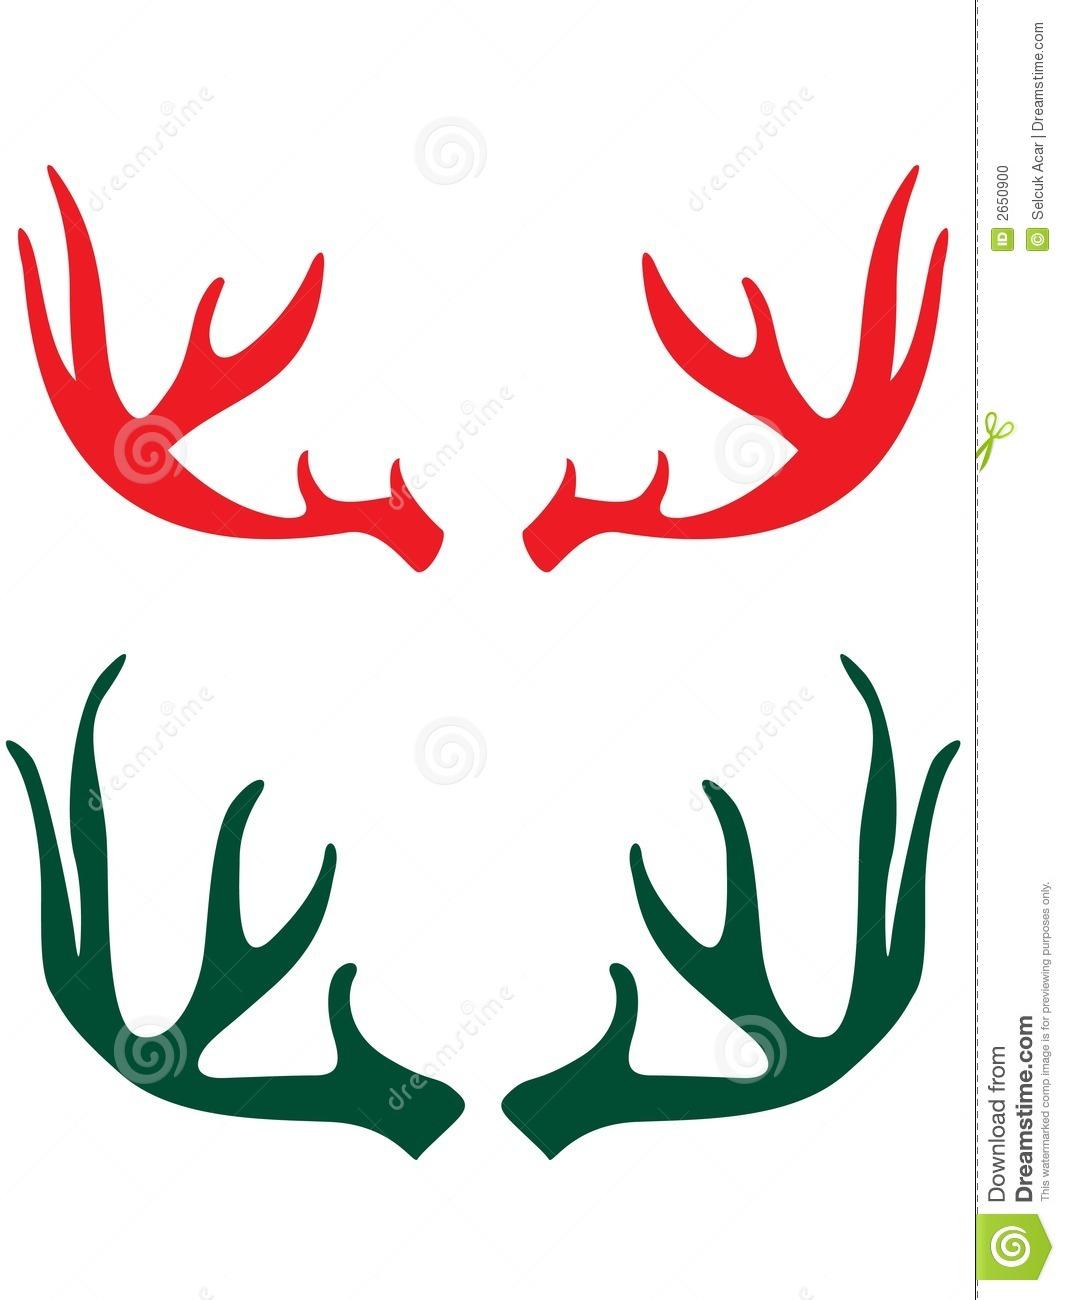 1065x1300 Deer Antlers Clipart Clipart Panda